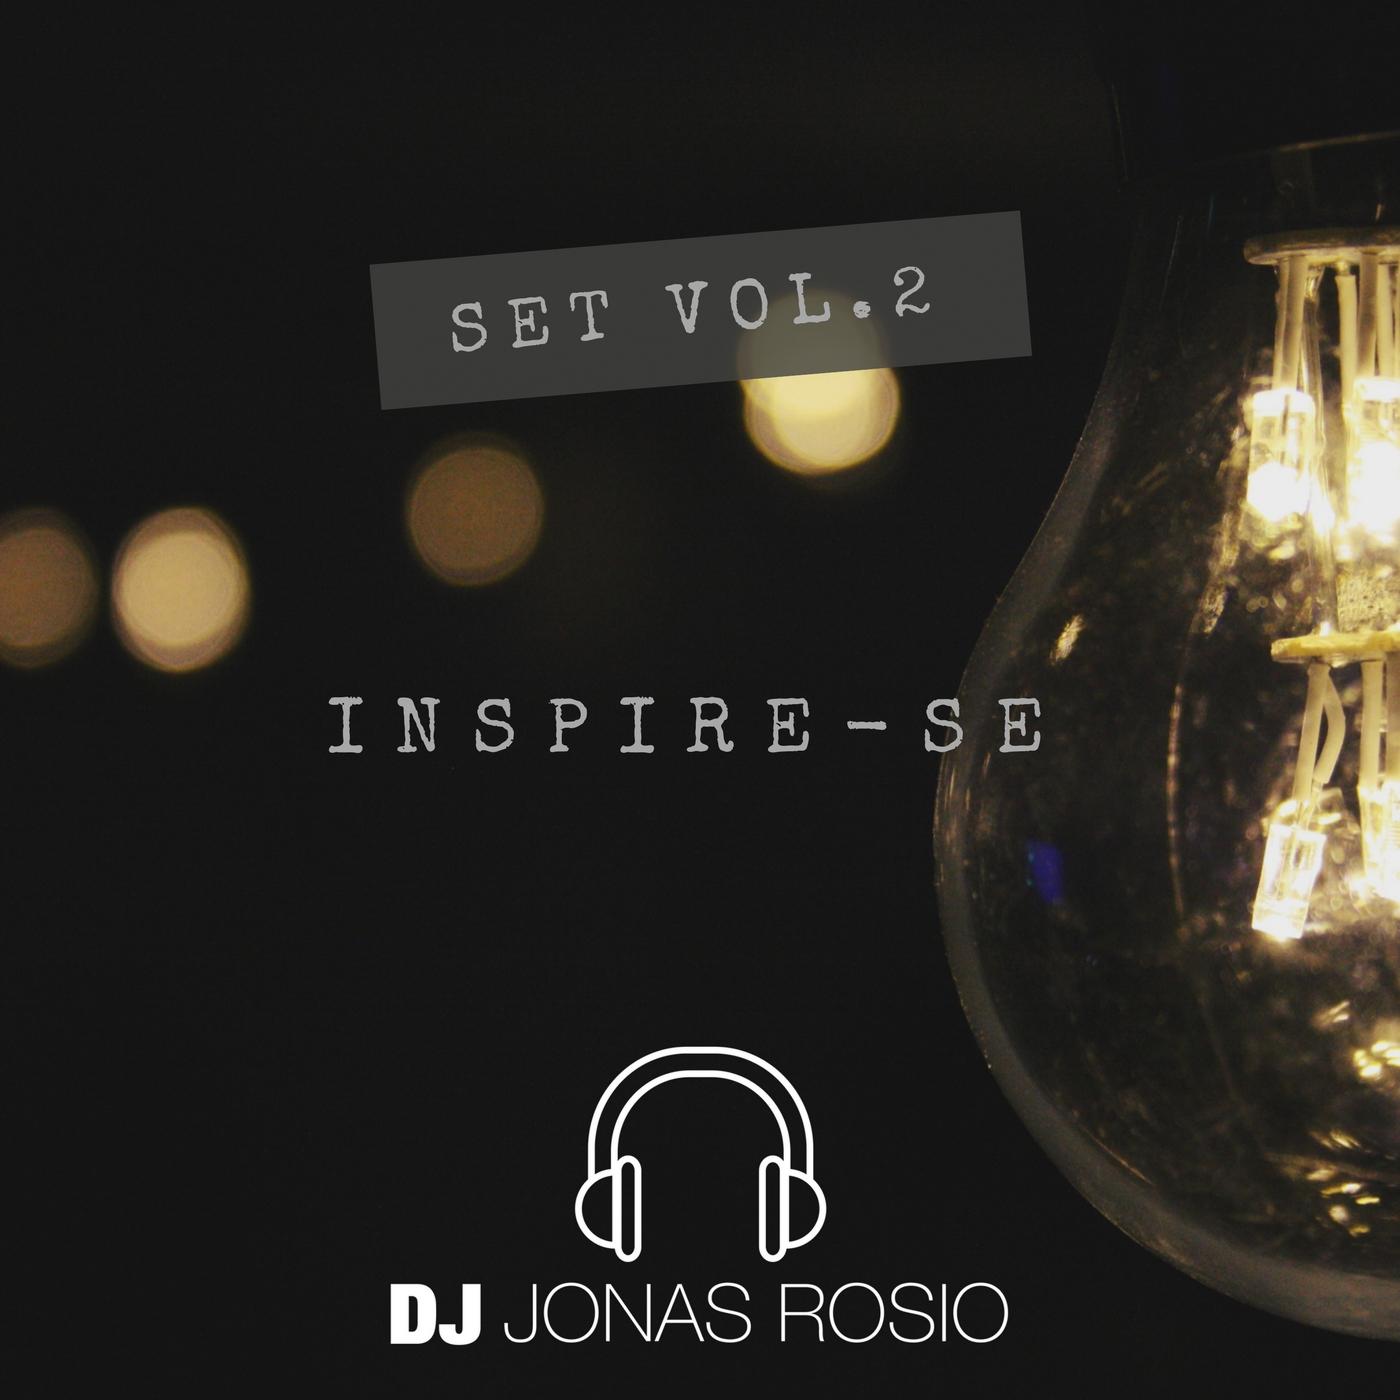 Cópia de Cópia de Cópia de Cópia de DJ Jonas Rosio.jpg